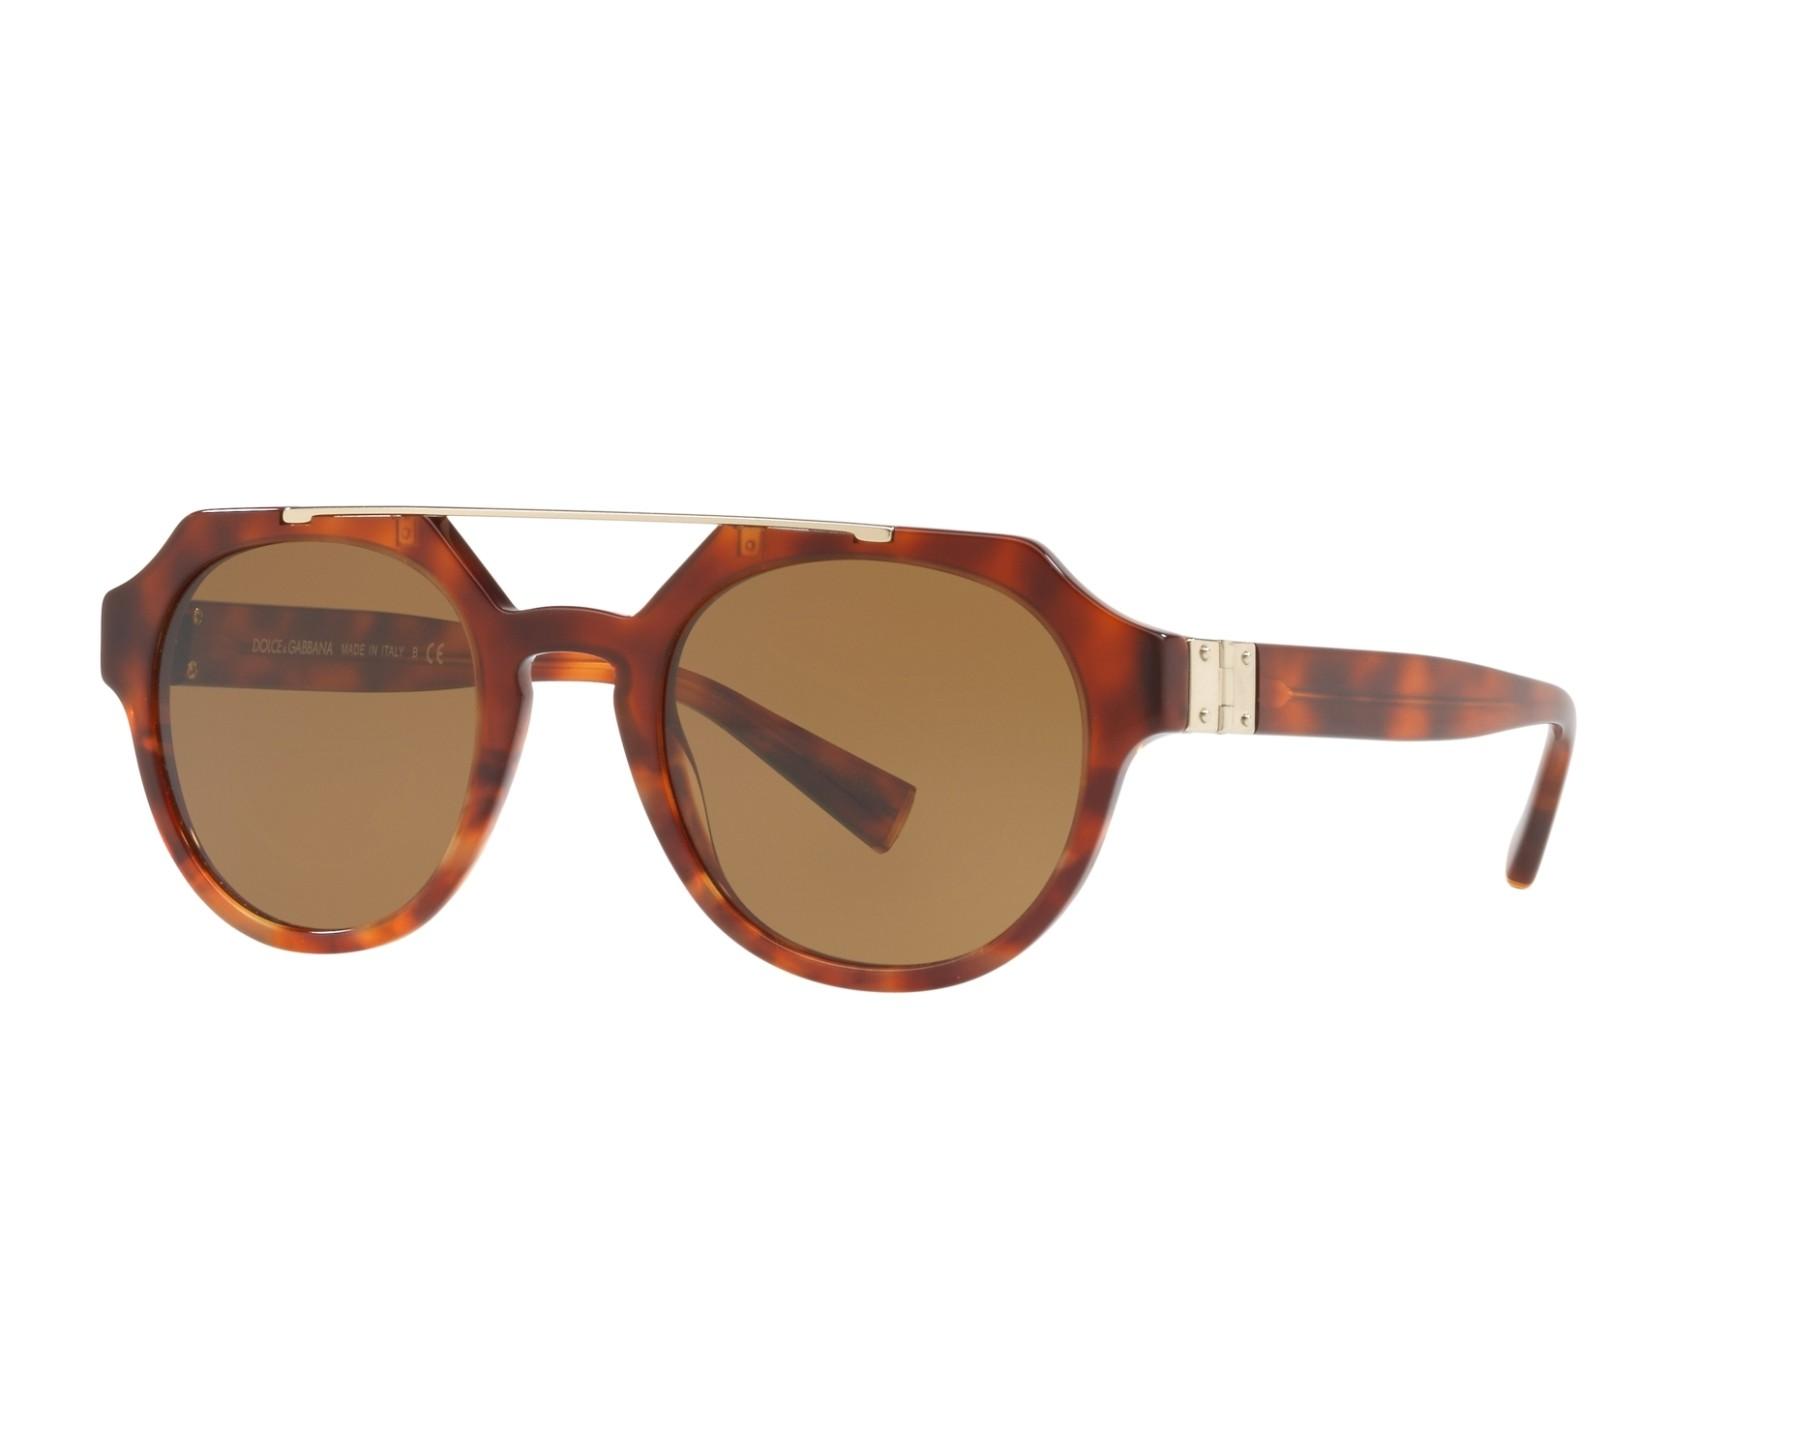 Dolce & Gabbana DG4313 314453 50-22 B4EFgl